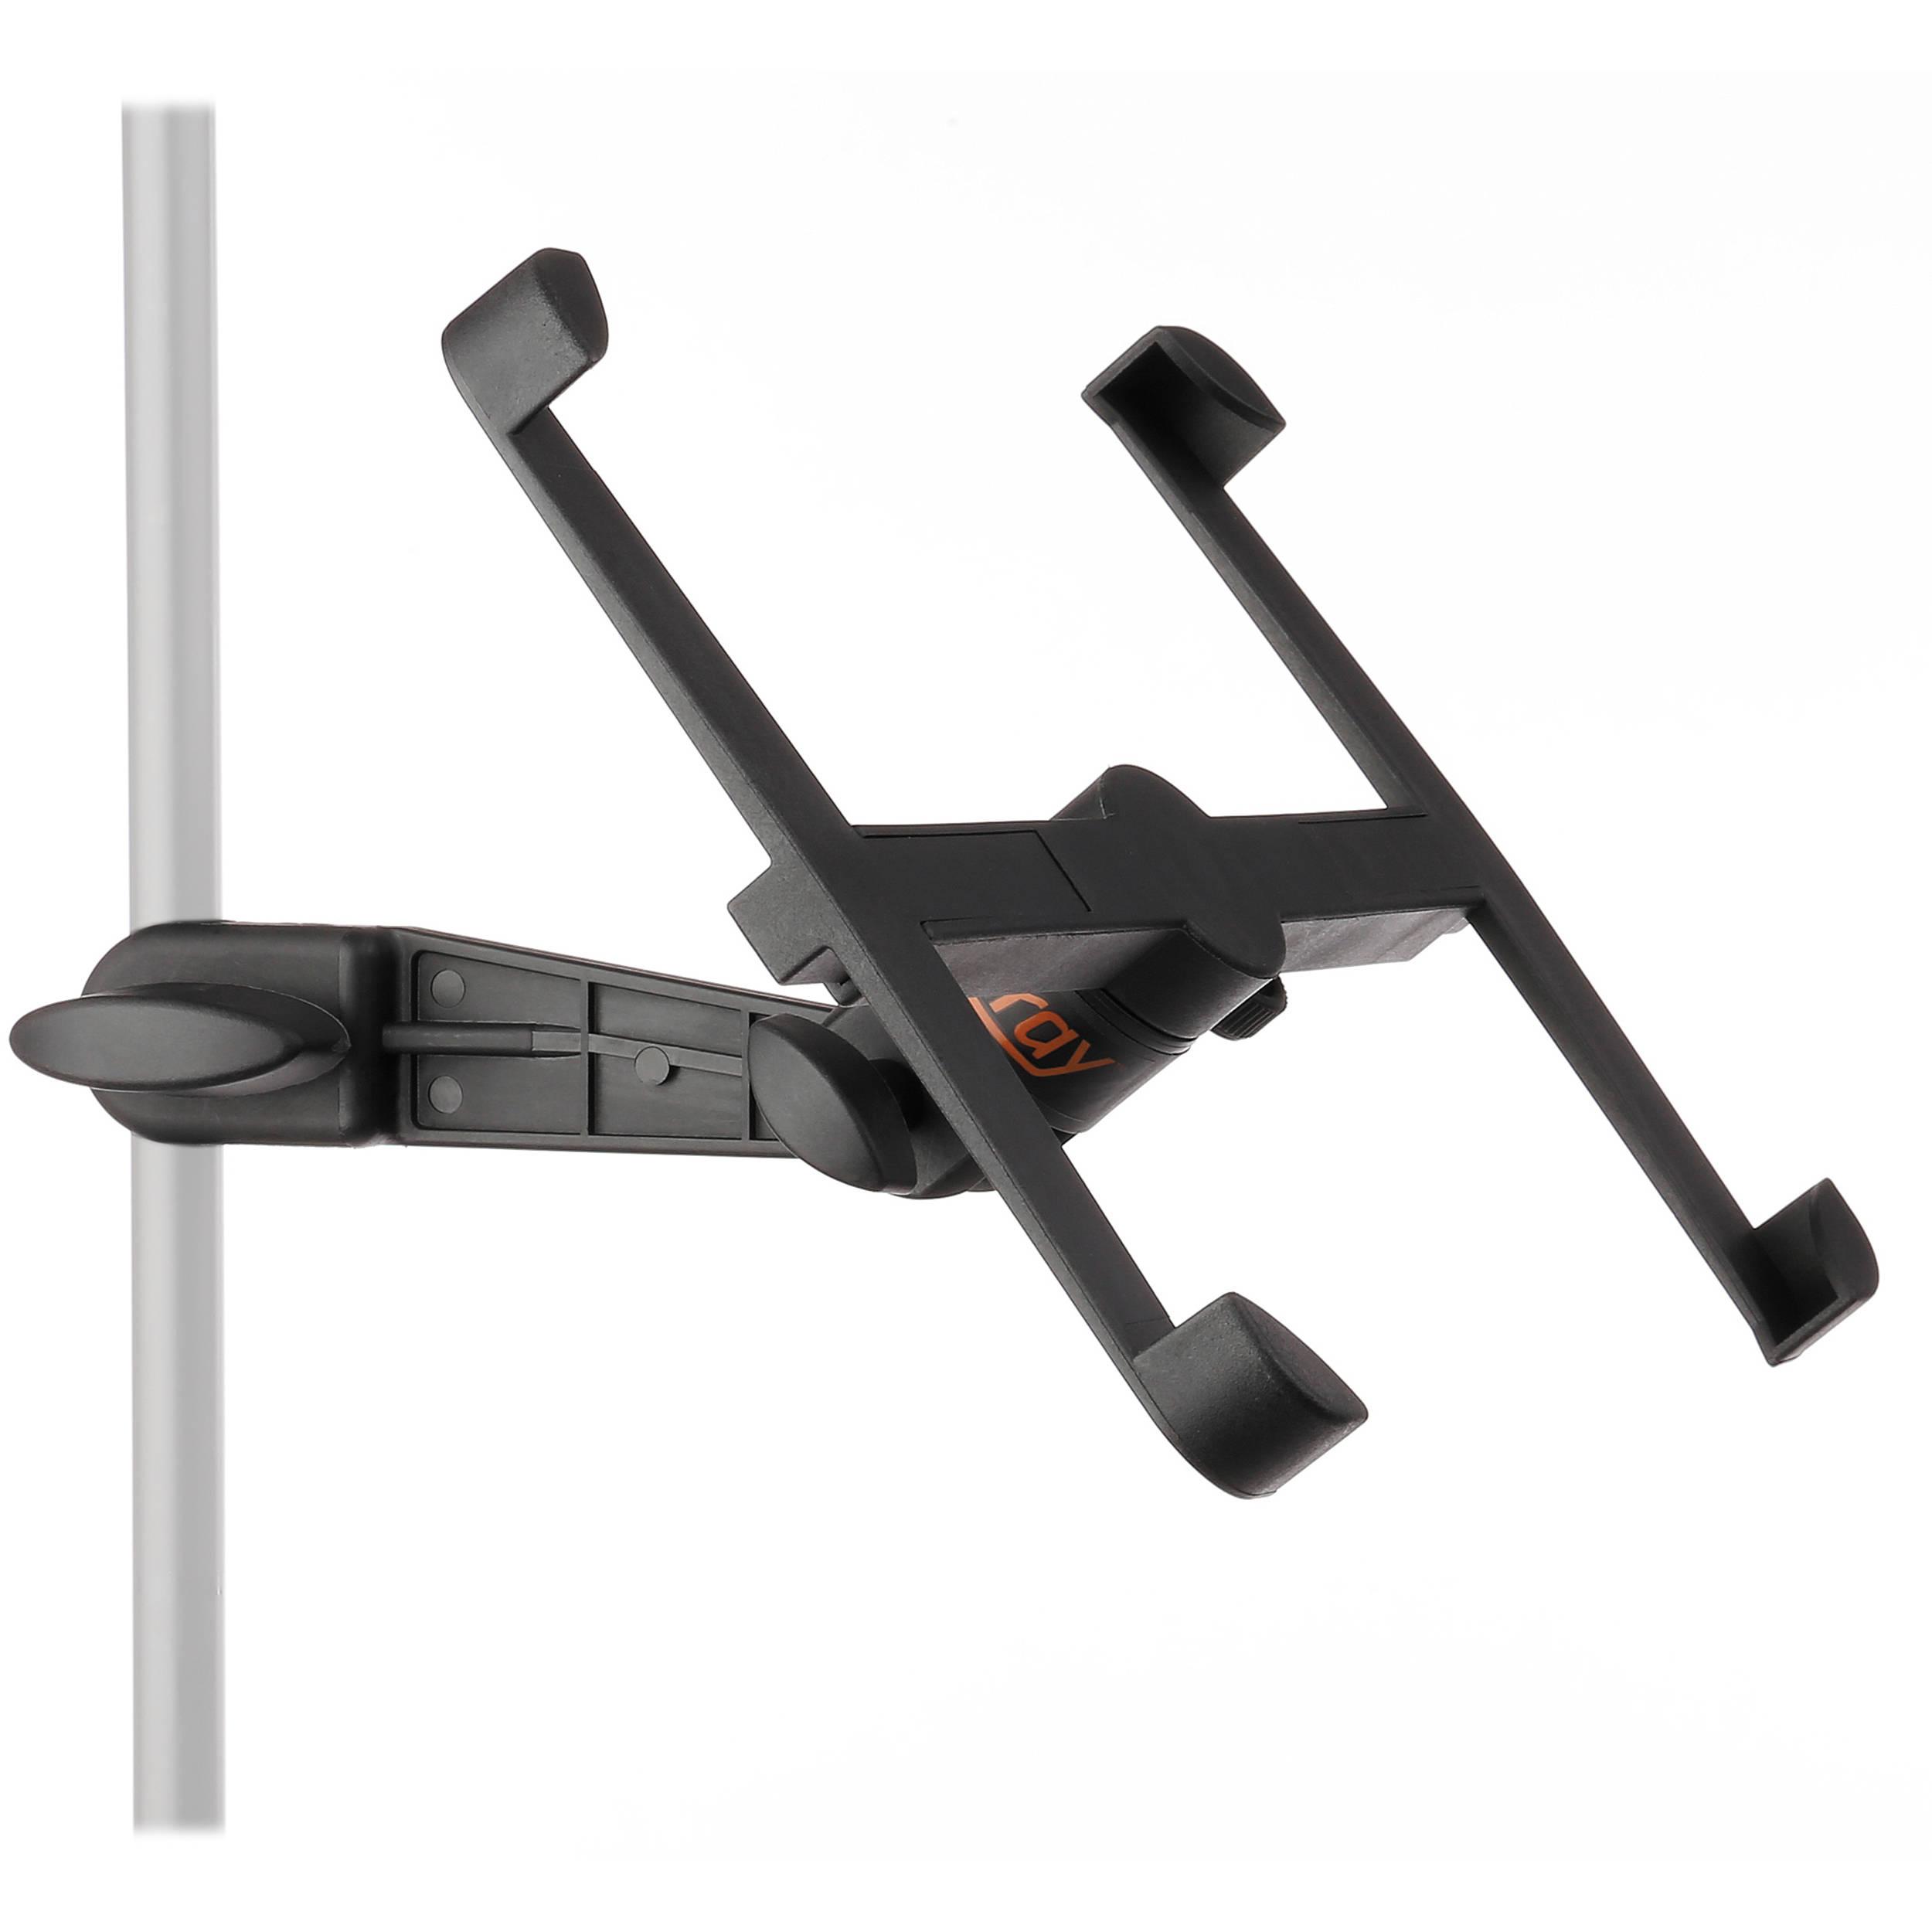 Ipad Mic Stand : auray ipd 101 ipad microphone stand adapter black ipd 101 b h ~ Hamham.info Haus und Dekorationen